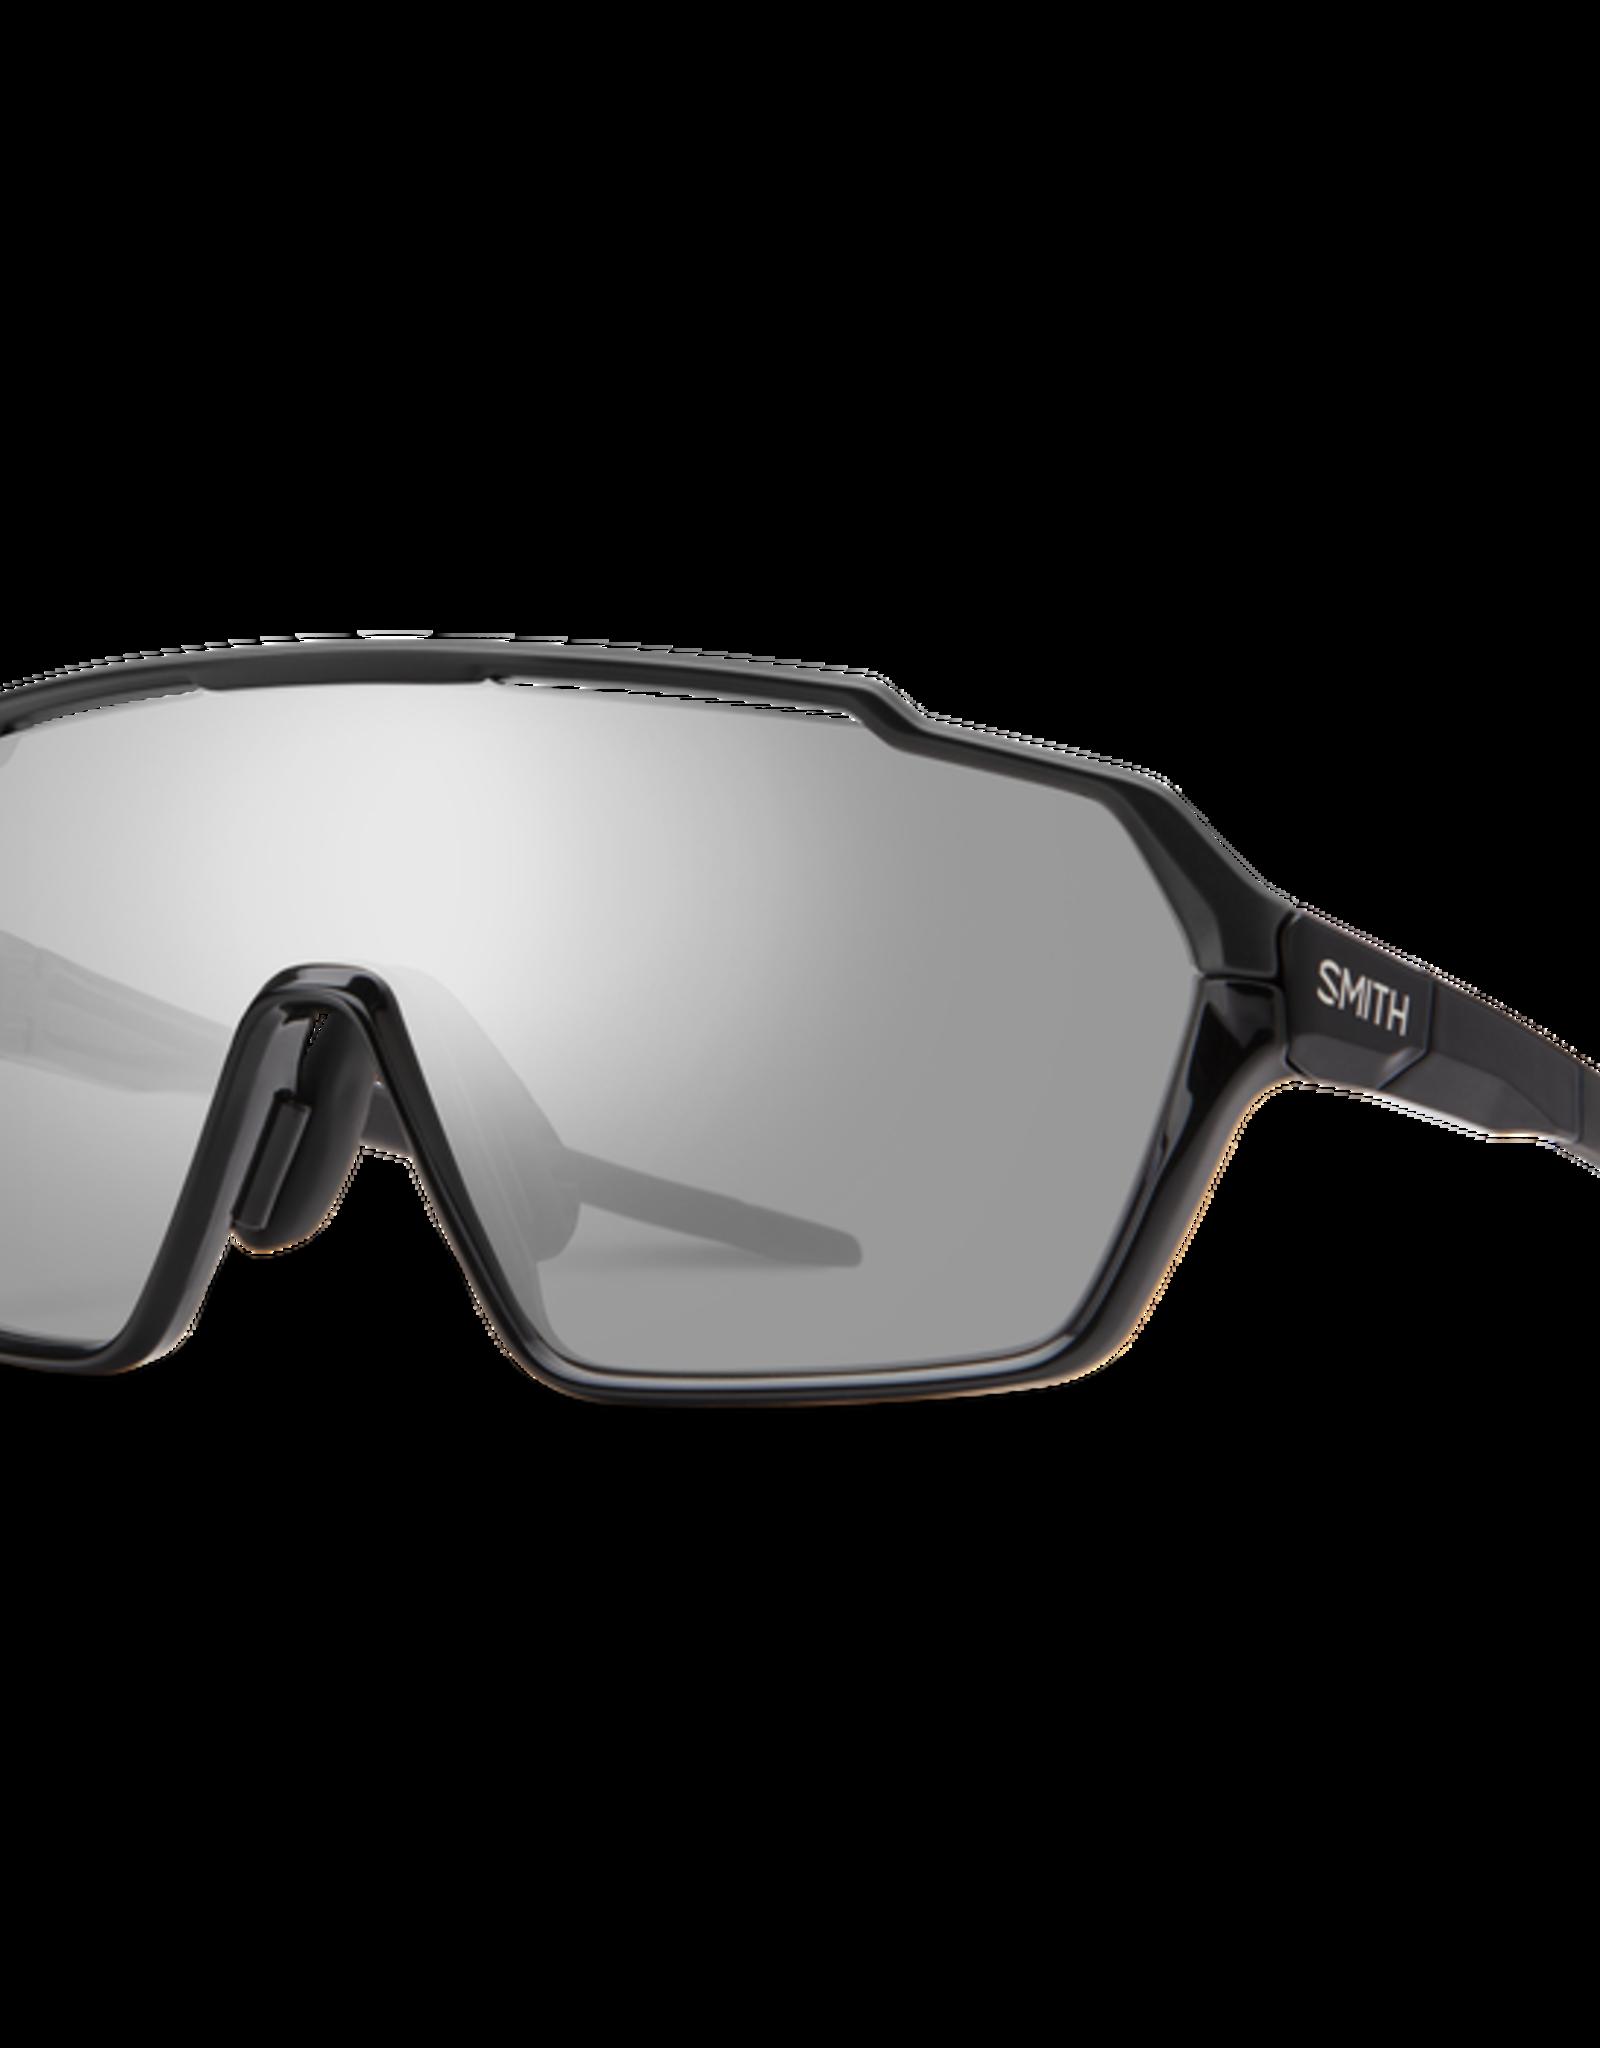 SMITH OPTICS SMITH Sunglasses SHIFT MAG Black ChromaPop Platinum/Clear